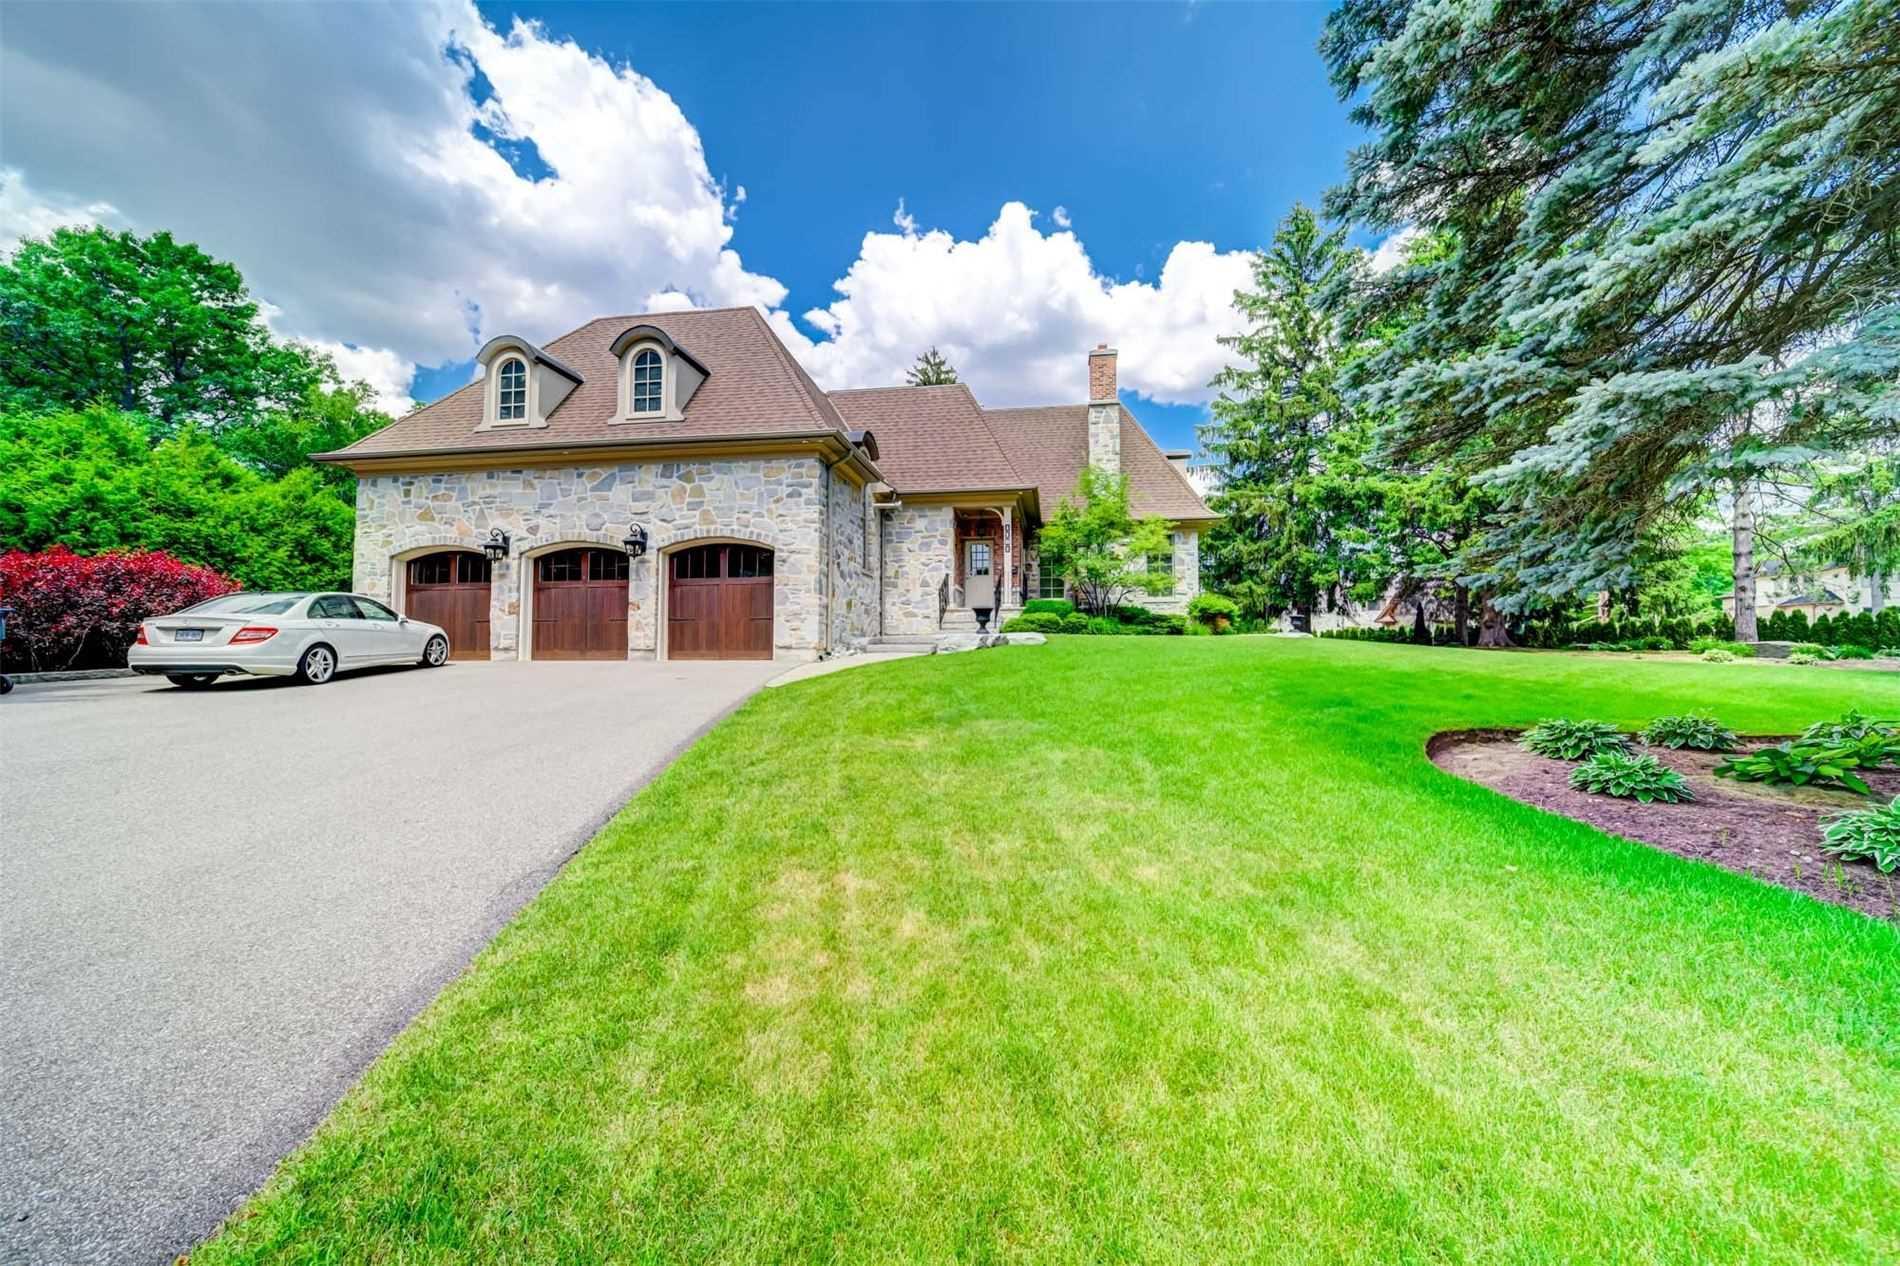 1161 Tecumseh Park Dr, Mississauga, Ontario L5H2W3, 4 Bedrooms Bedrooms, 10 Rooms Rooms,8 BathroomsBathrooms,Detached,For Sale,Tecumseh Park,W5061278